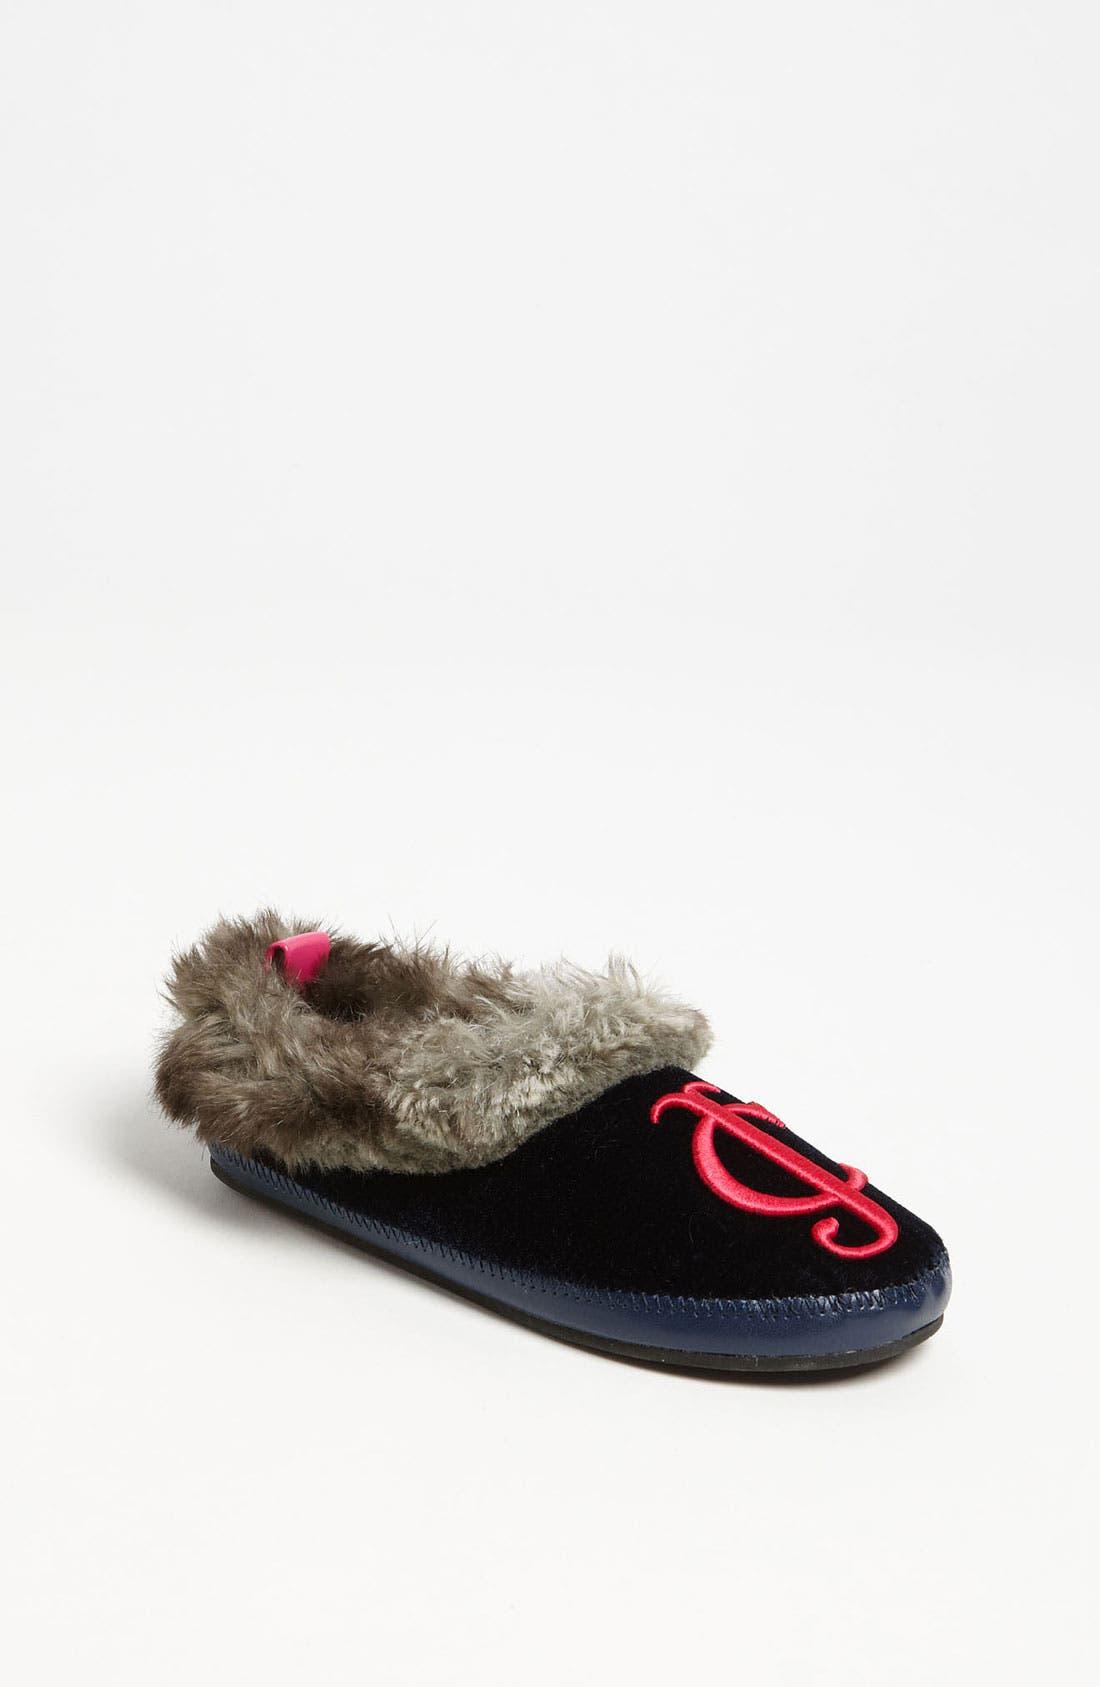 Alternate Image 1 Selected - Juicy Couture 'Kelly' Slipper (Toddler, Little Kid & Big Kid)